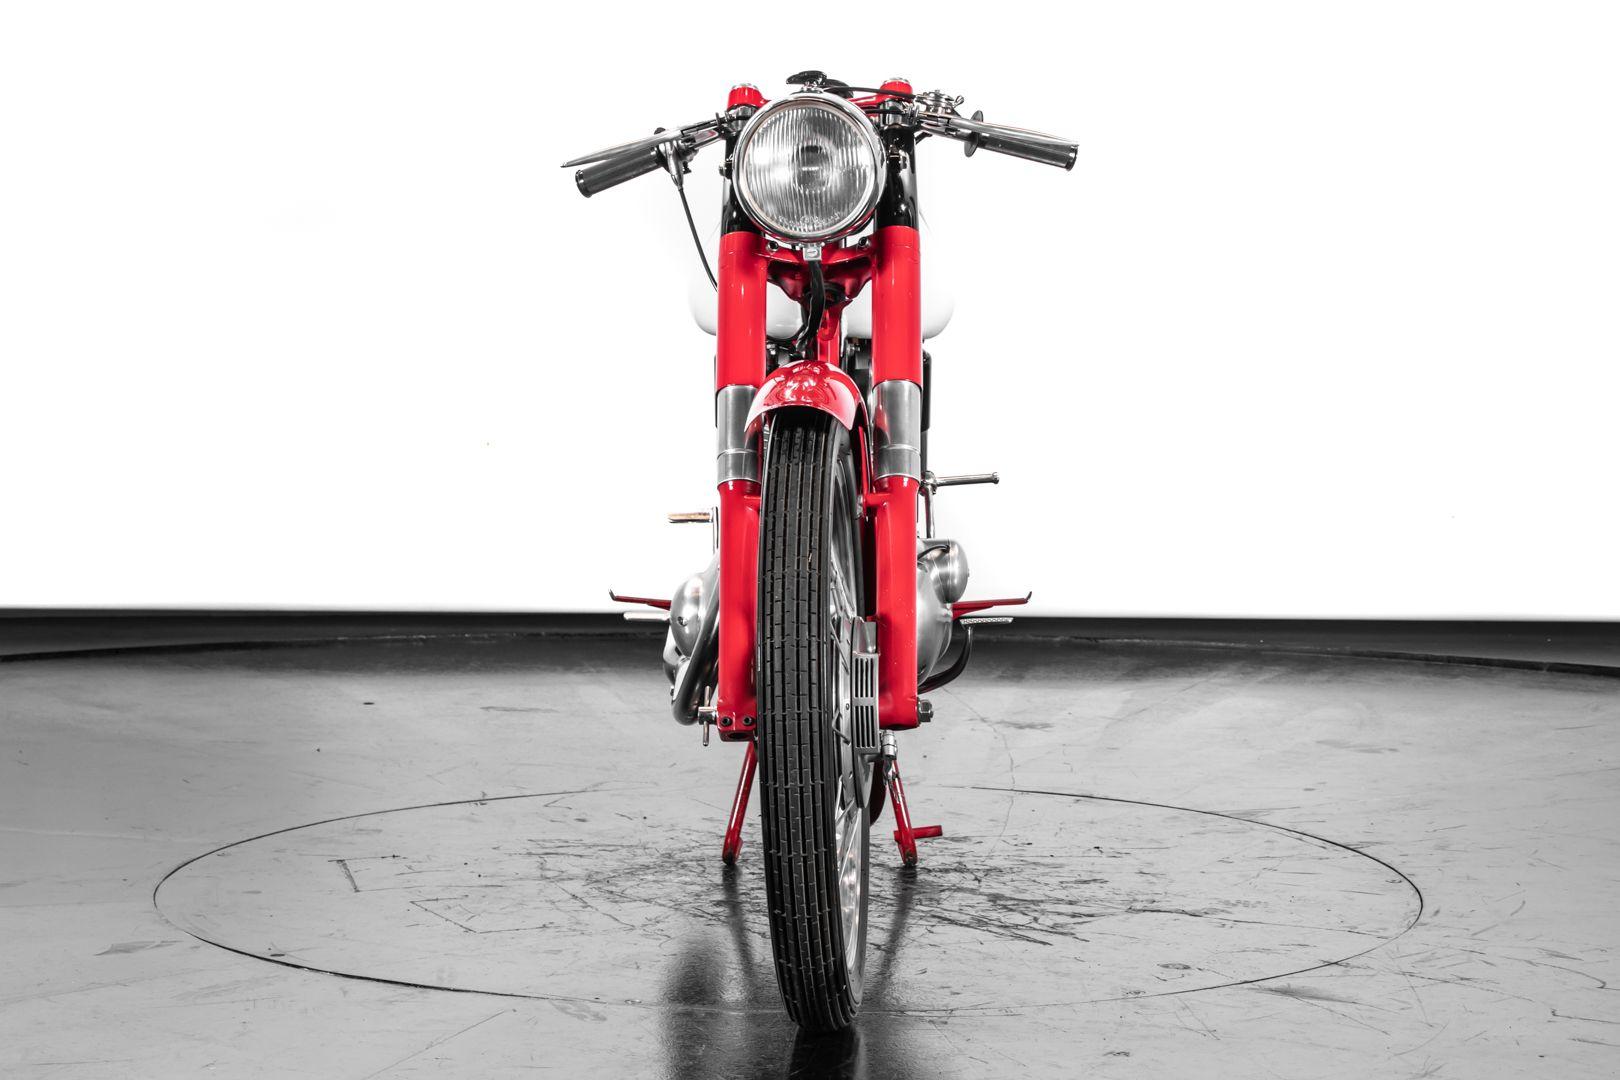 1958 Moto Morini S 175 78014